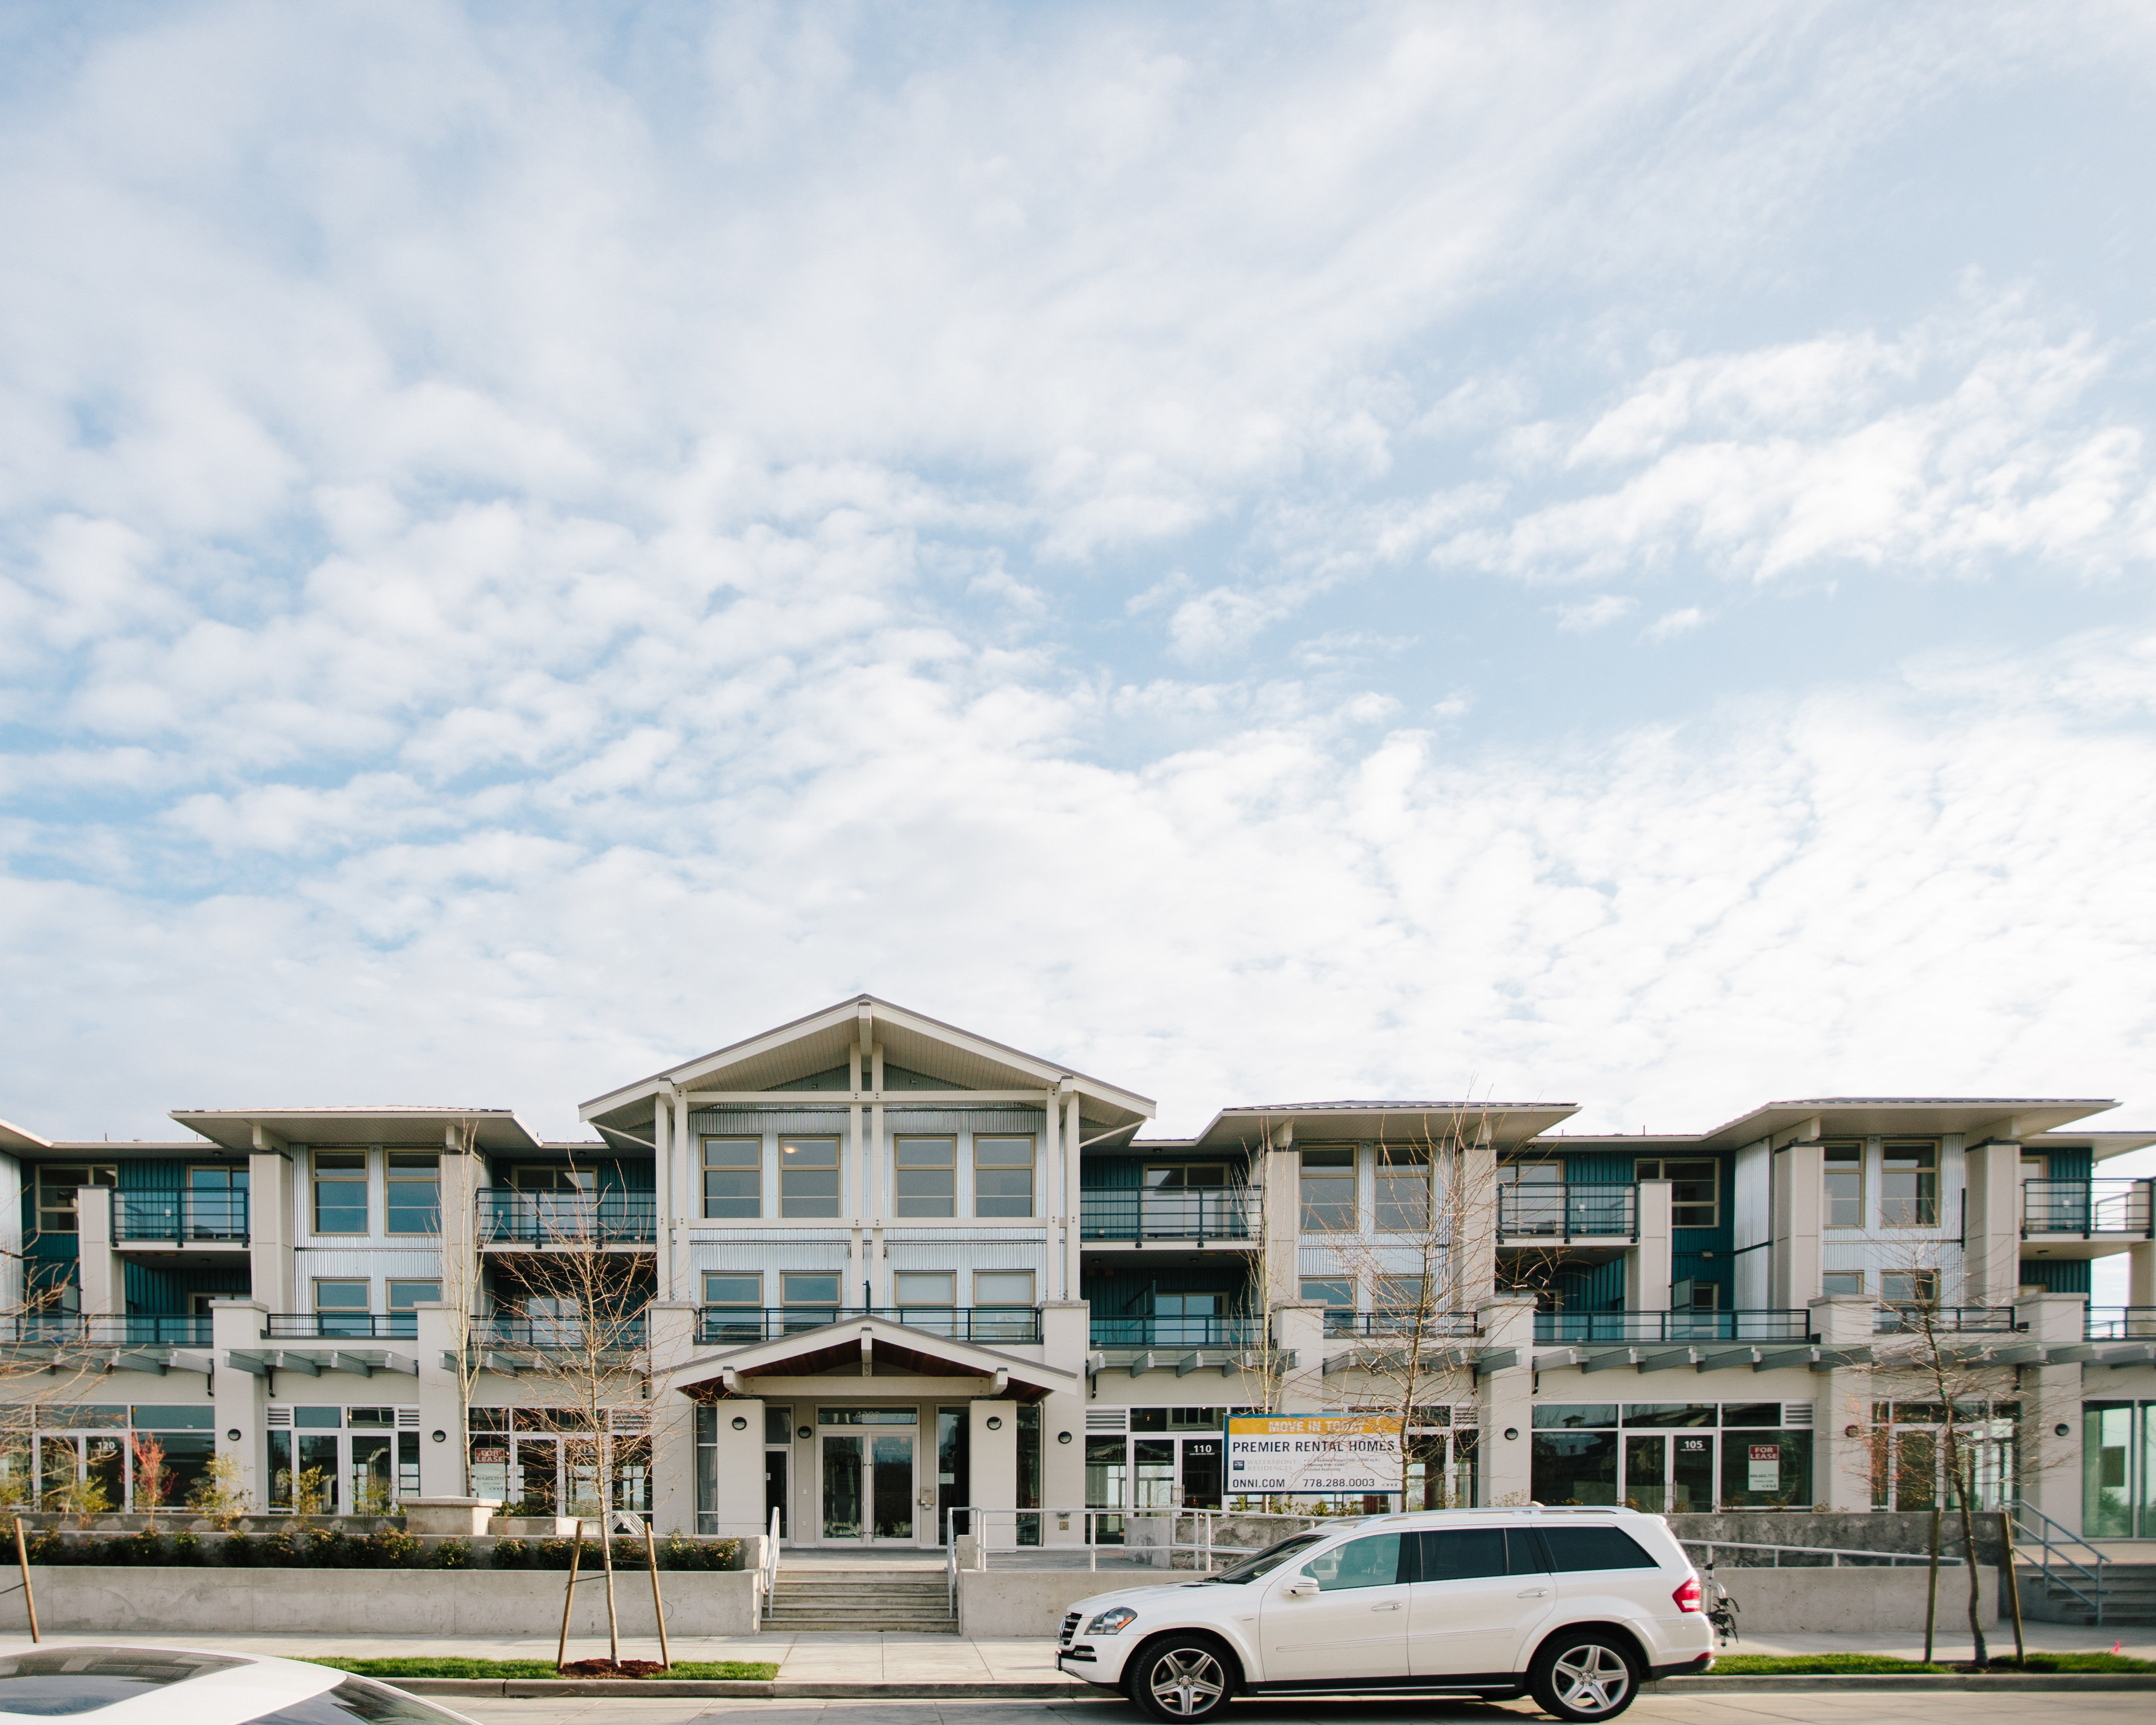 4280 Bayview St, Richmond, BC V7E 6S8, Canada Exterior!